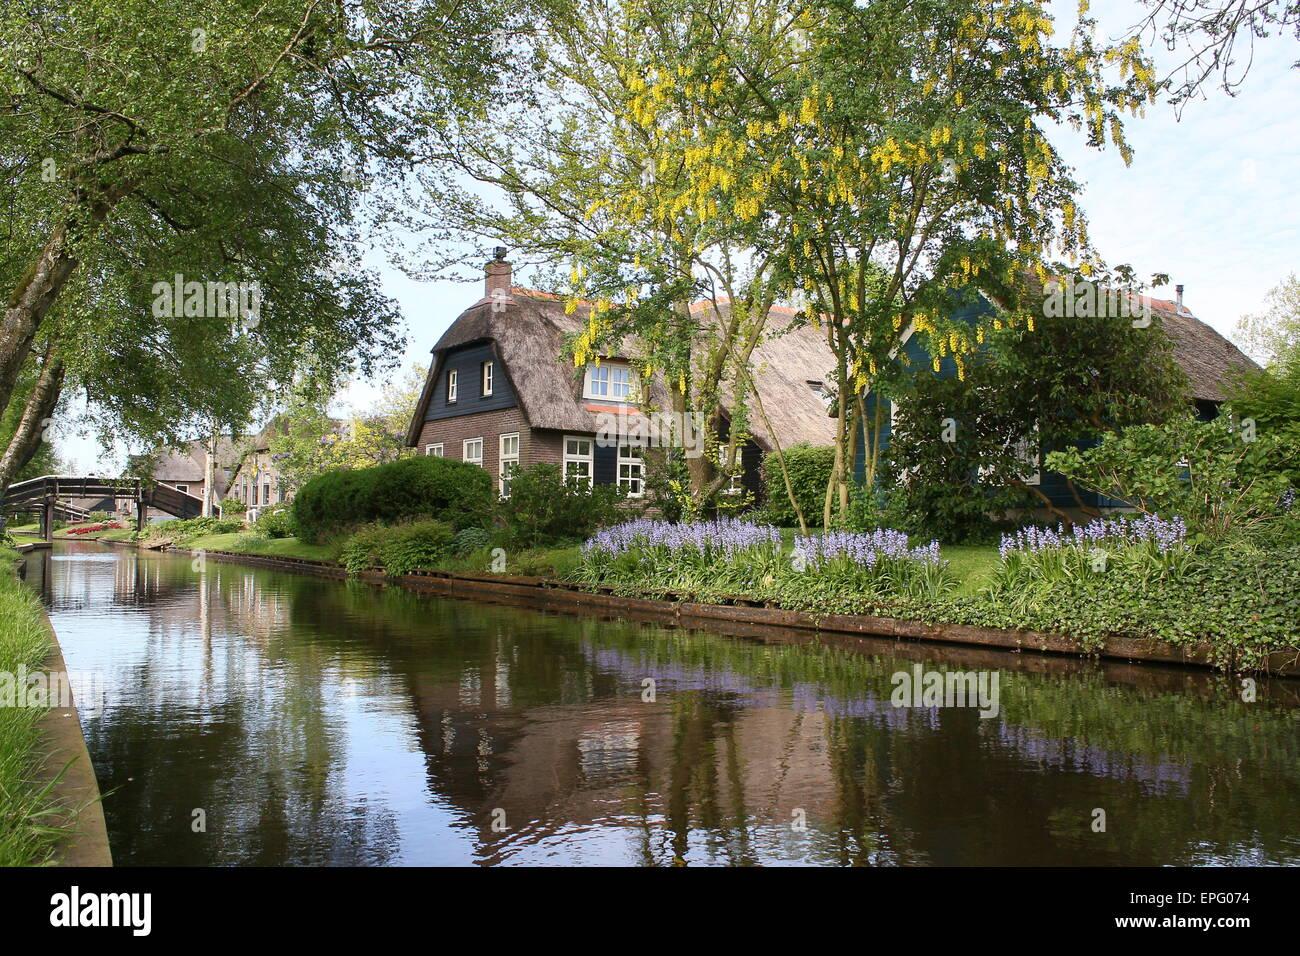 Springtime colours in the popular tourist village of Giethoorn, Overijssel, The Netherlands Stock Photo